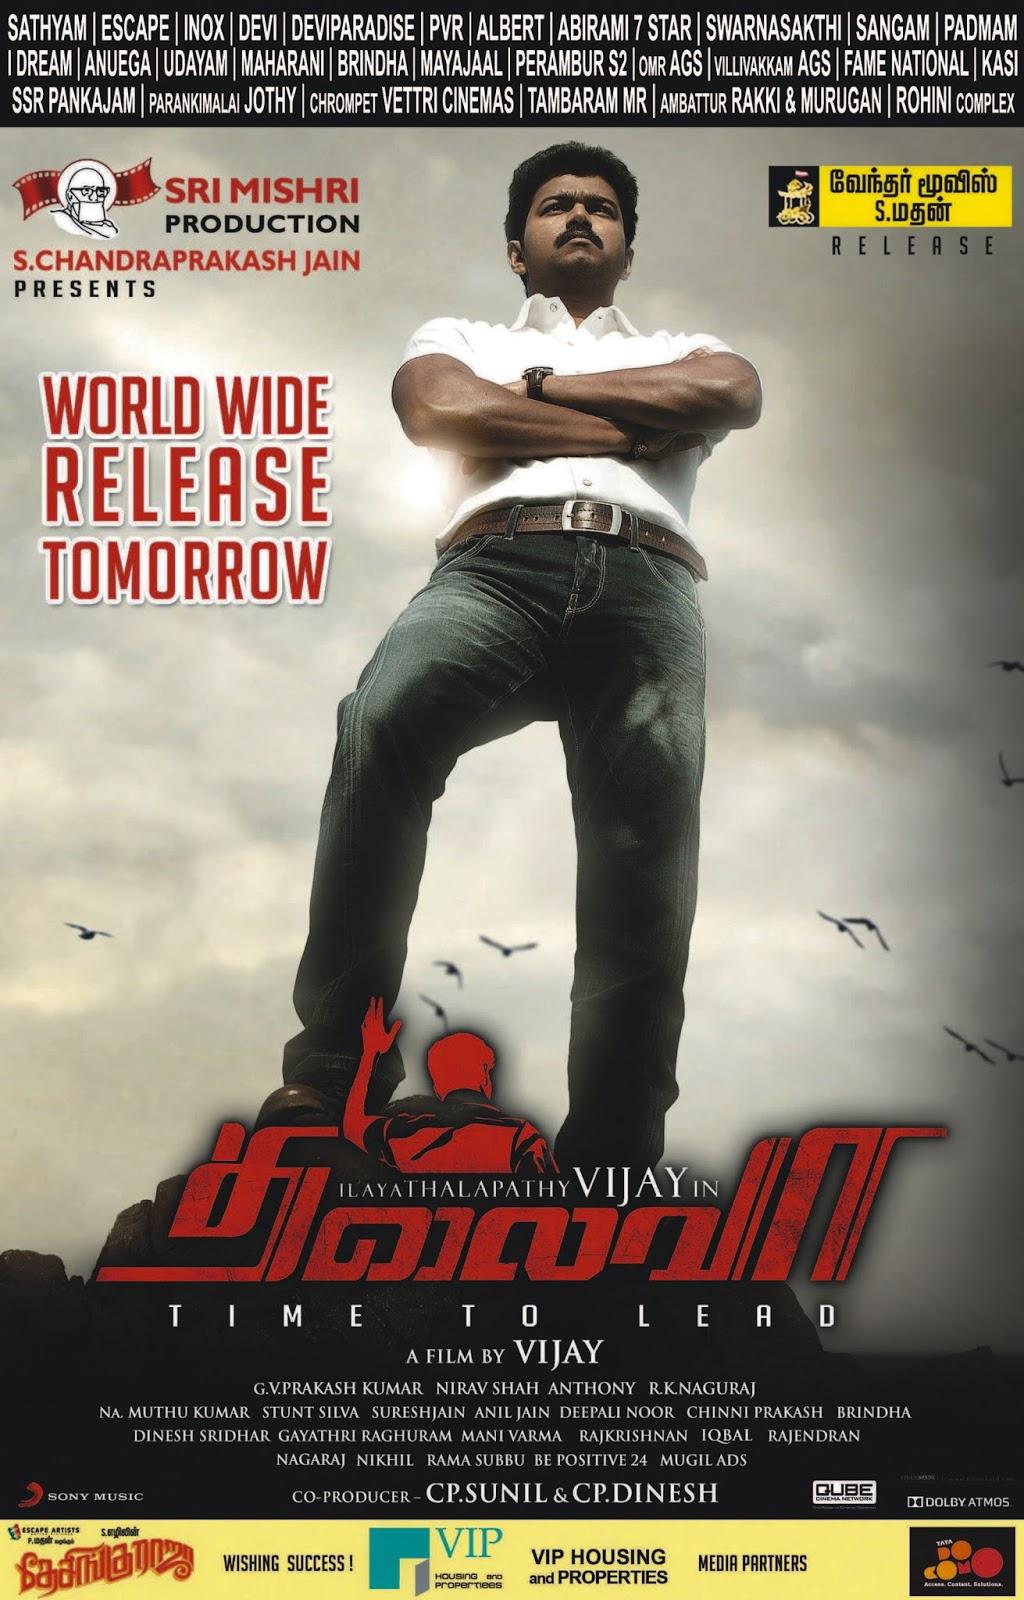 New Tamil Movie Poster Latest Tamil Movie Poster New Movie ...